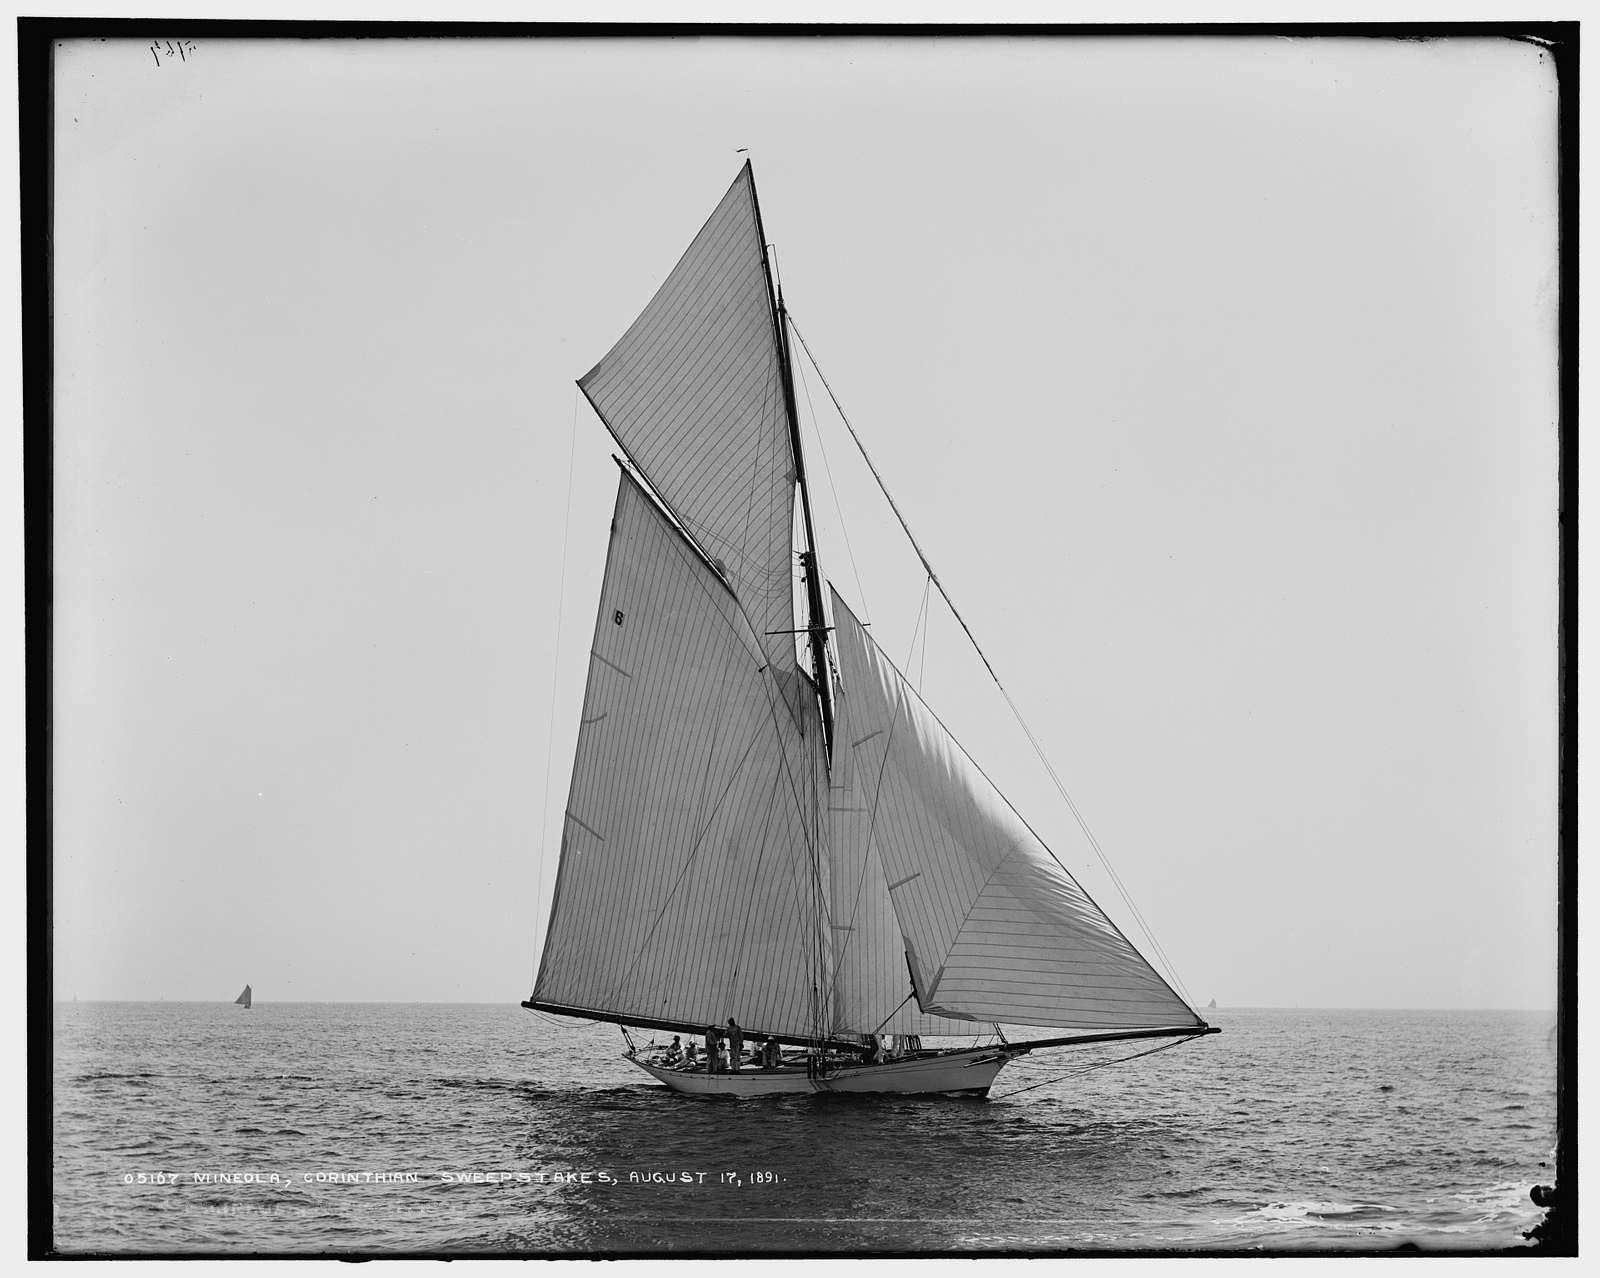 Mineola, Corinthian Sweepstakes, August 17, 1891